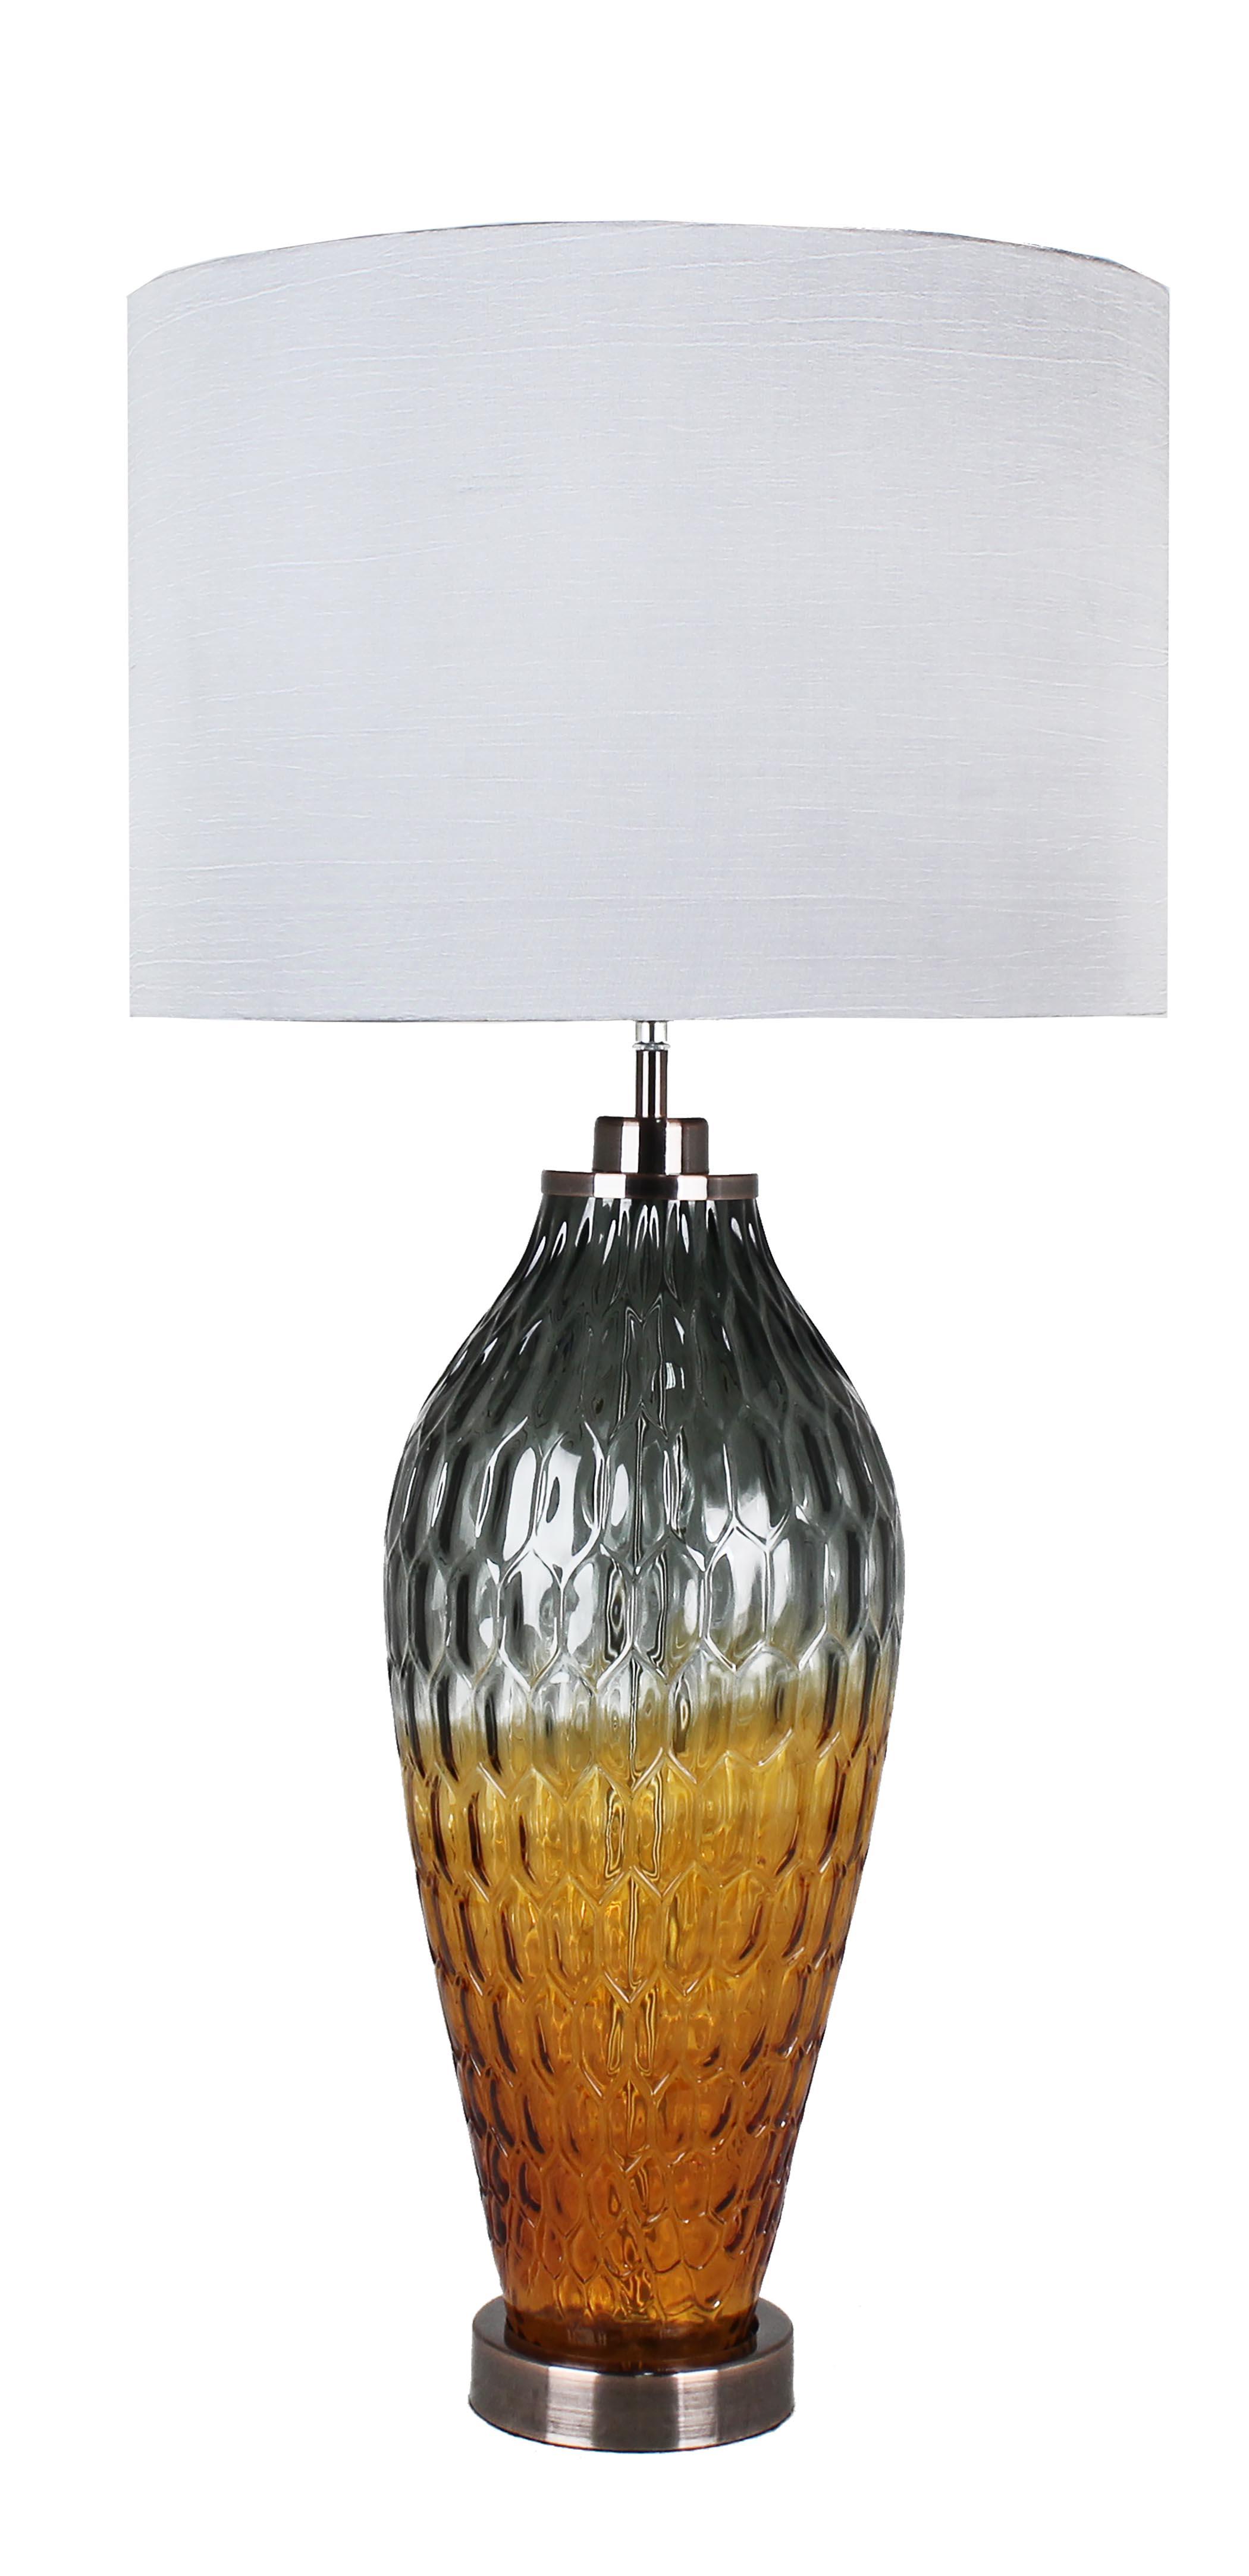 Viterra Honeycomb table lamp